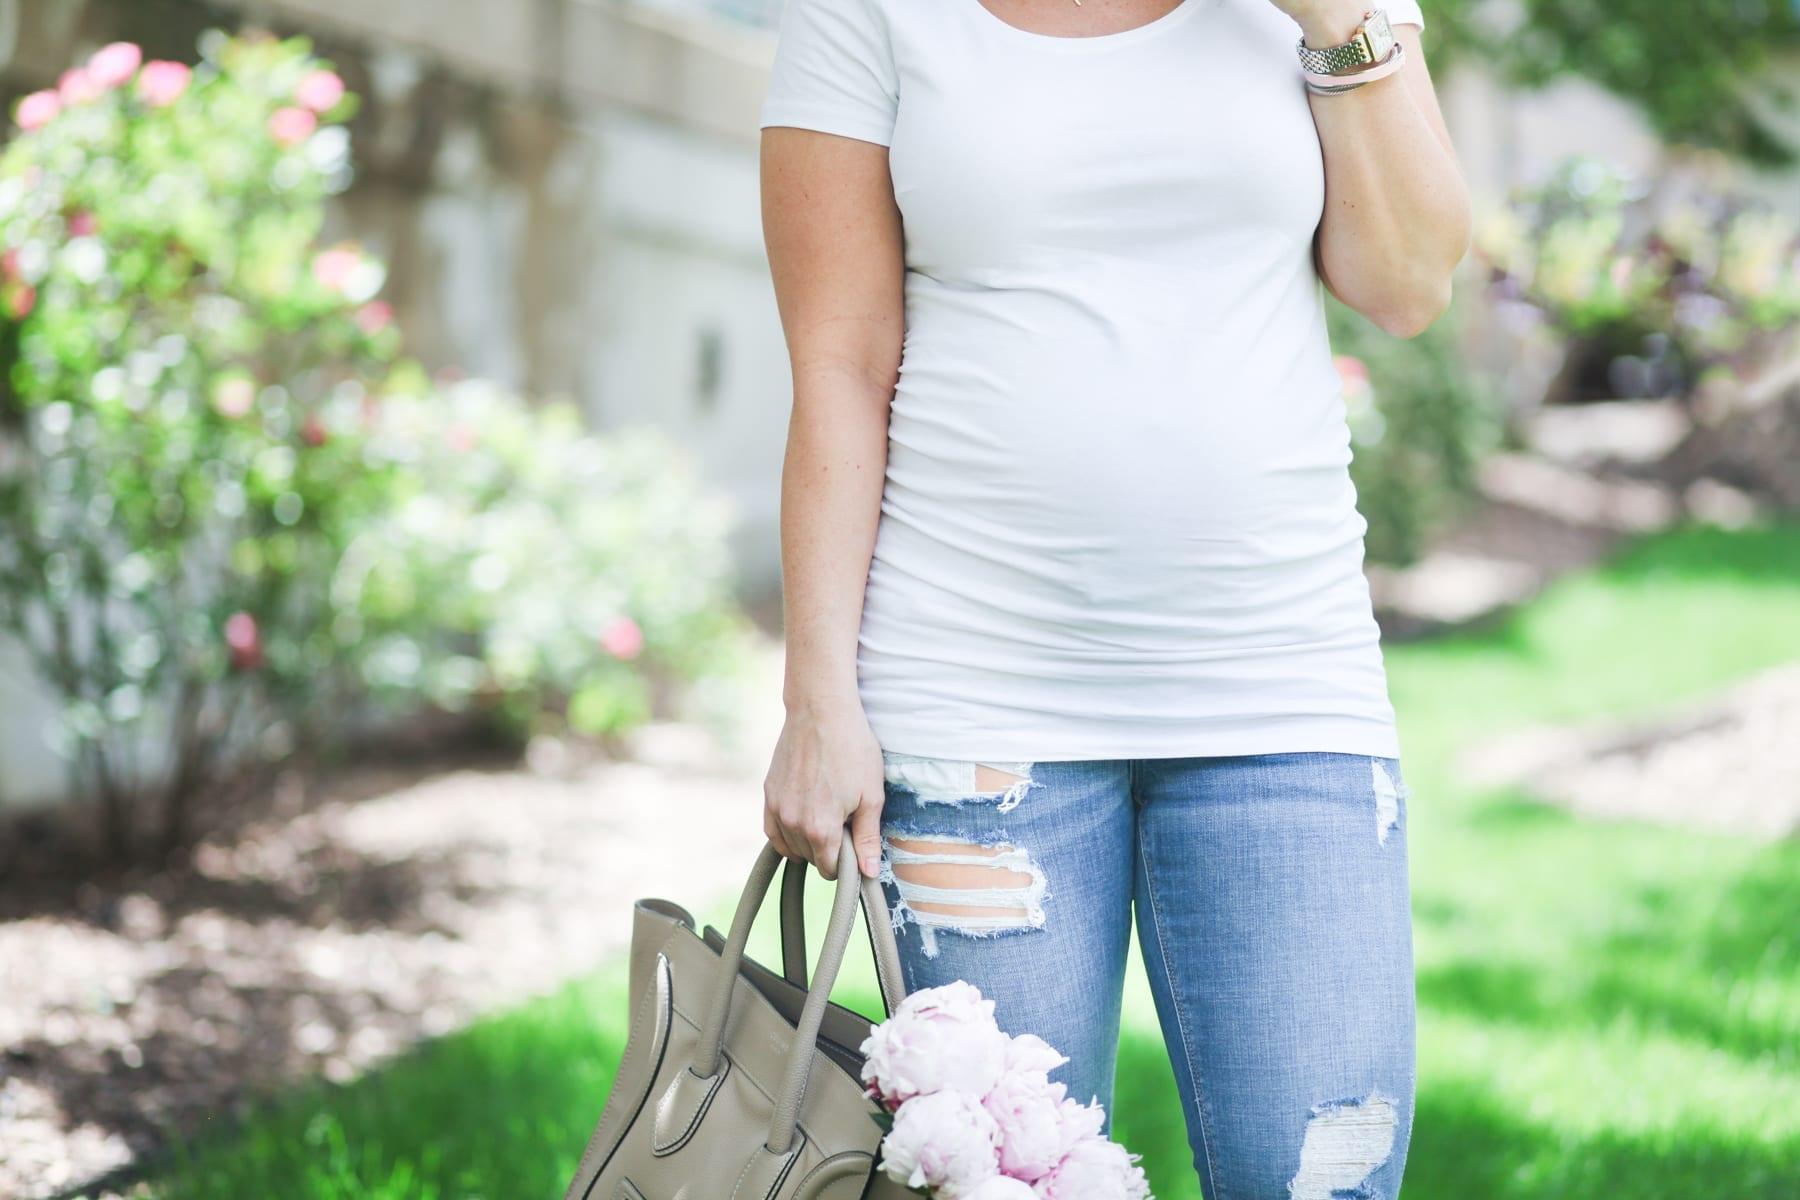 Ashley Pletcher - Celine bag - ripped jeans - flowers - peonies - white tee shirt - fashion blogger - maternity - mom blog